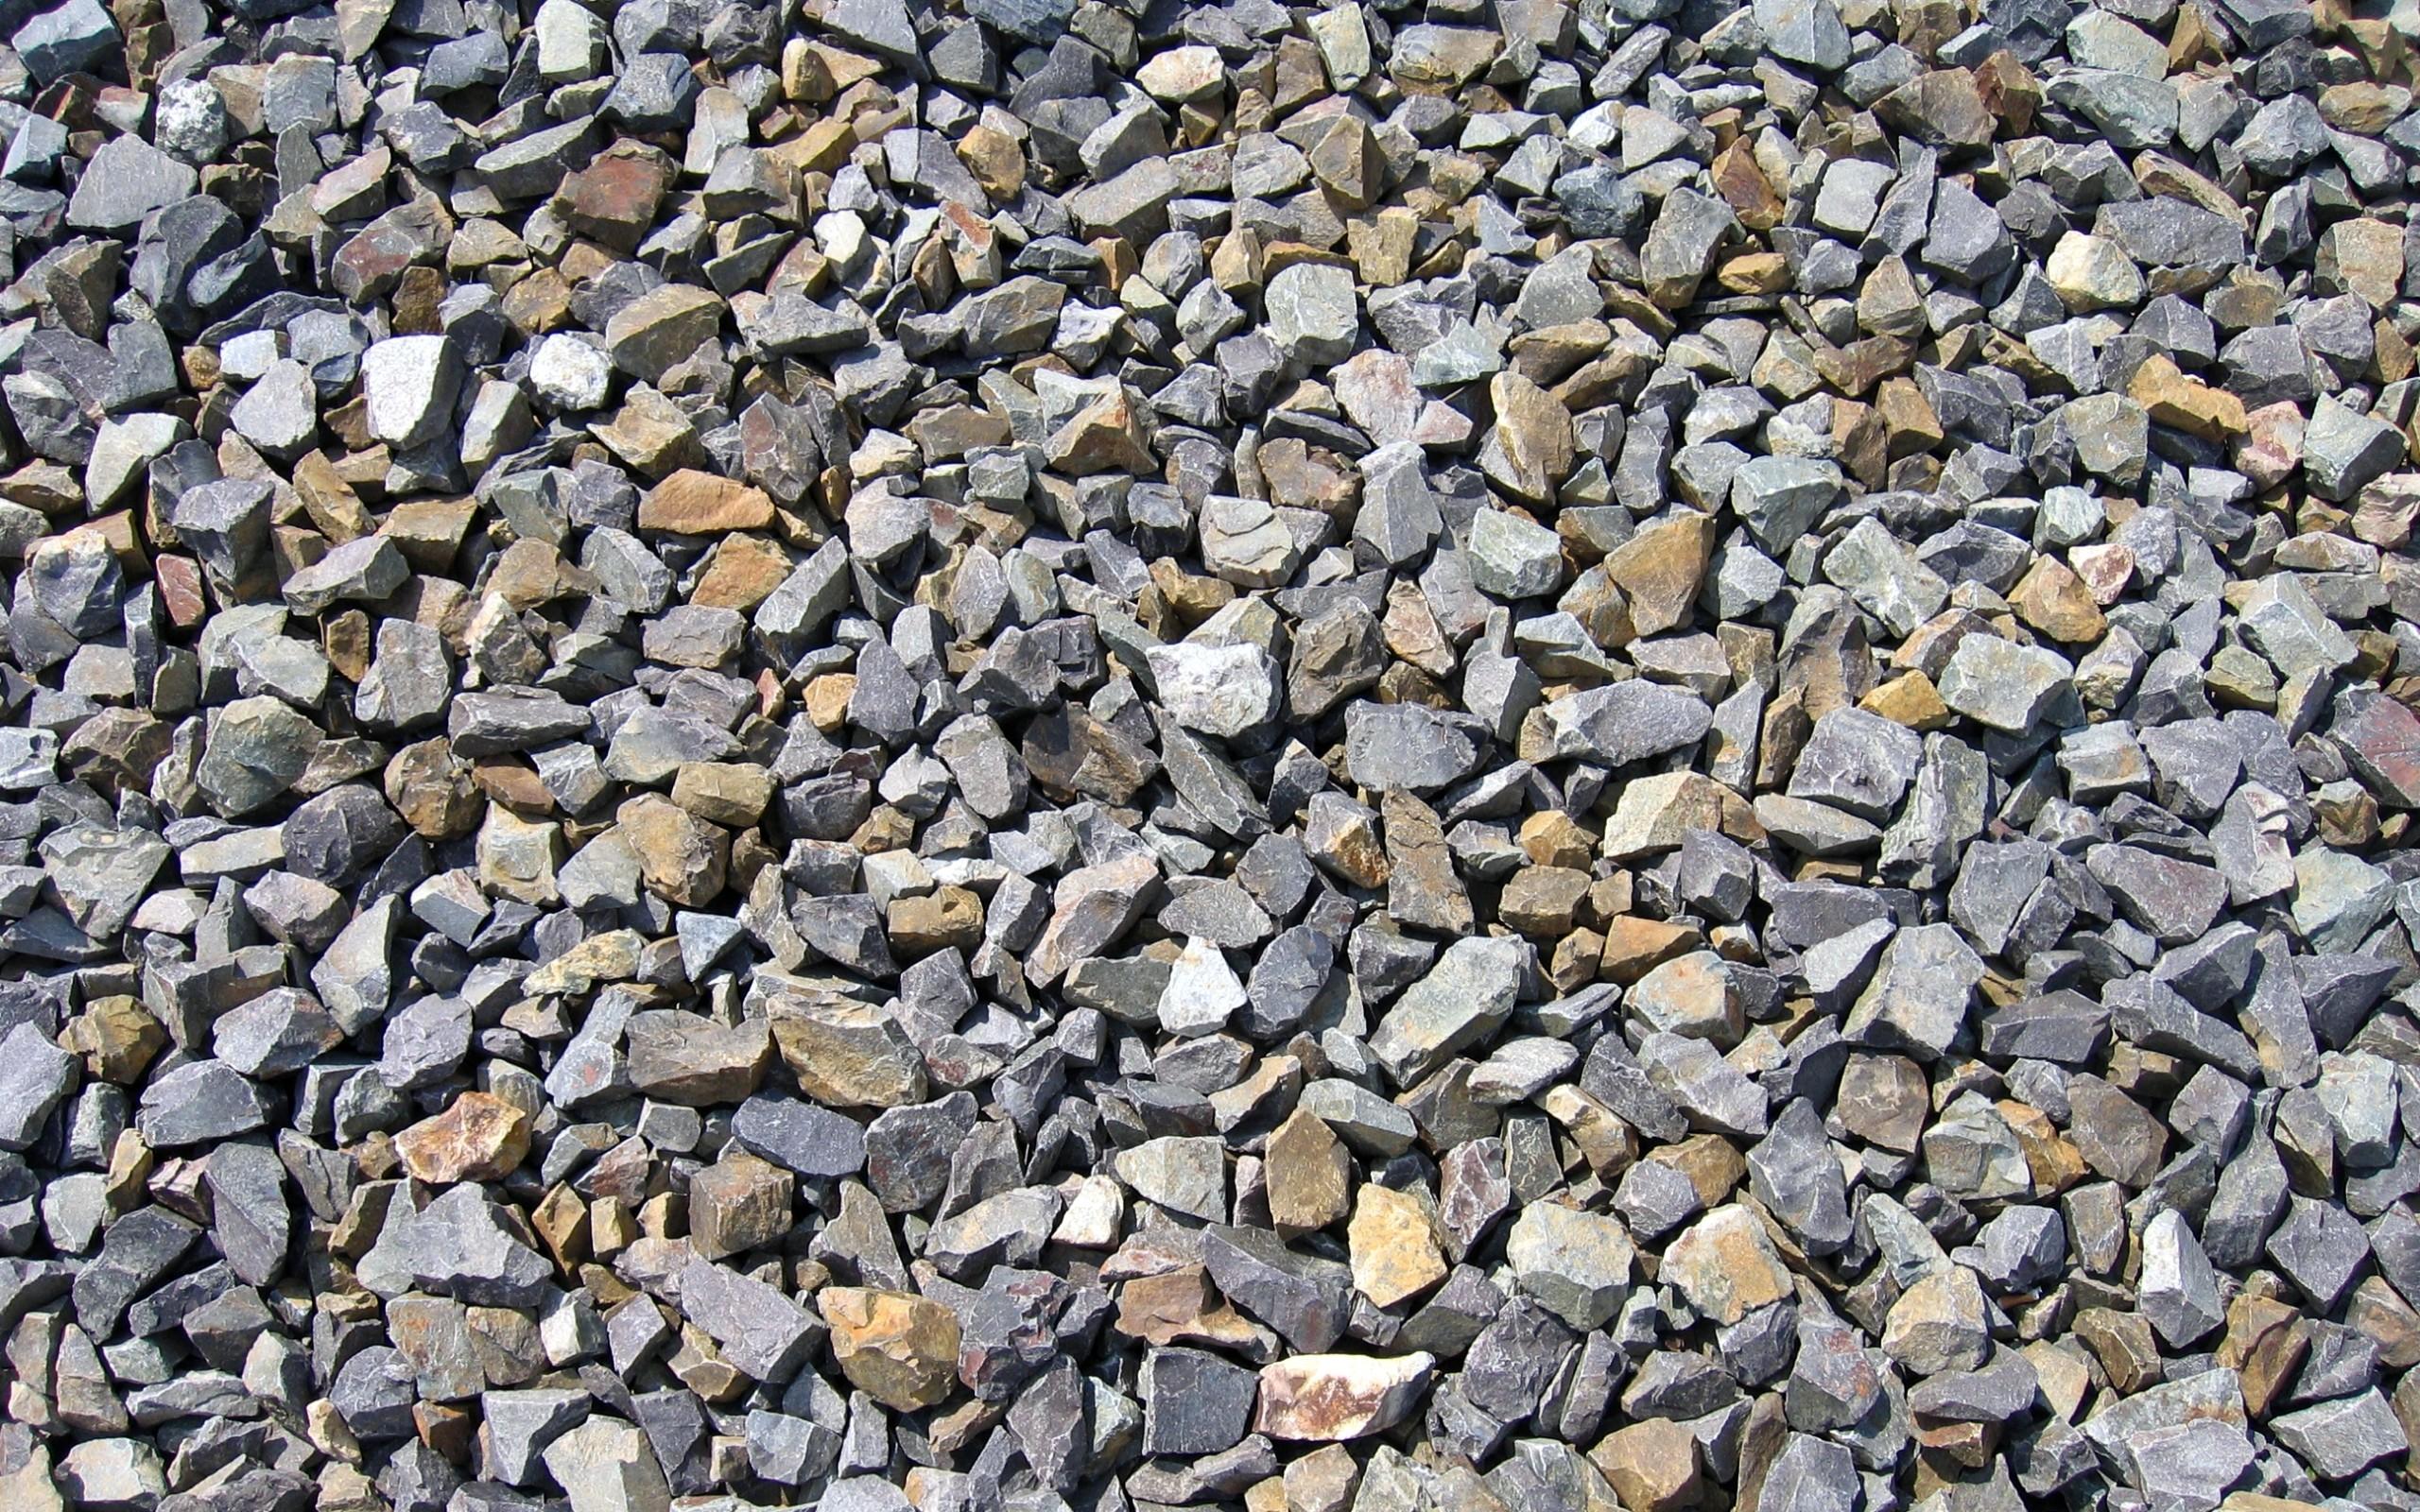 Textura de piedras cortadas - 2560x1600